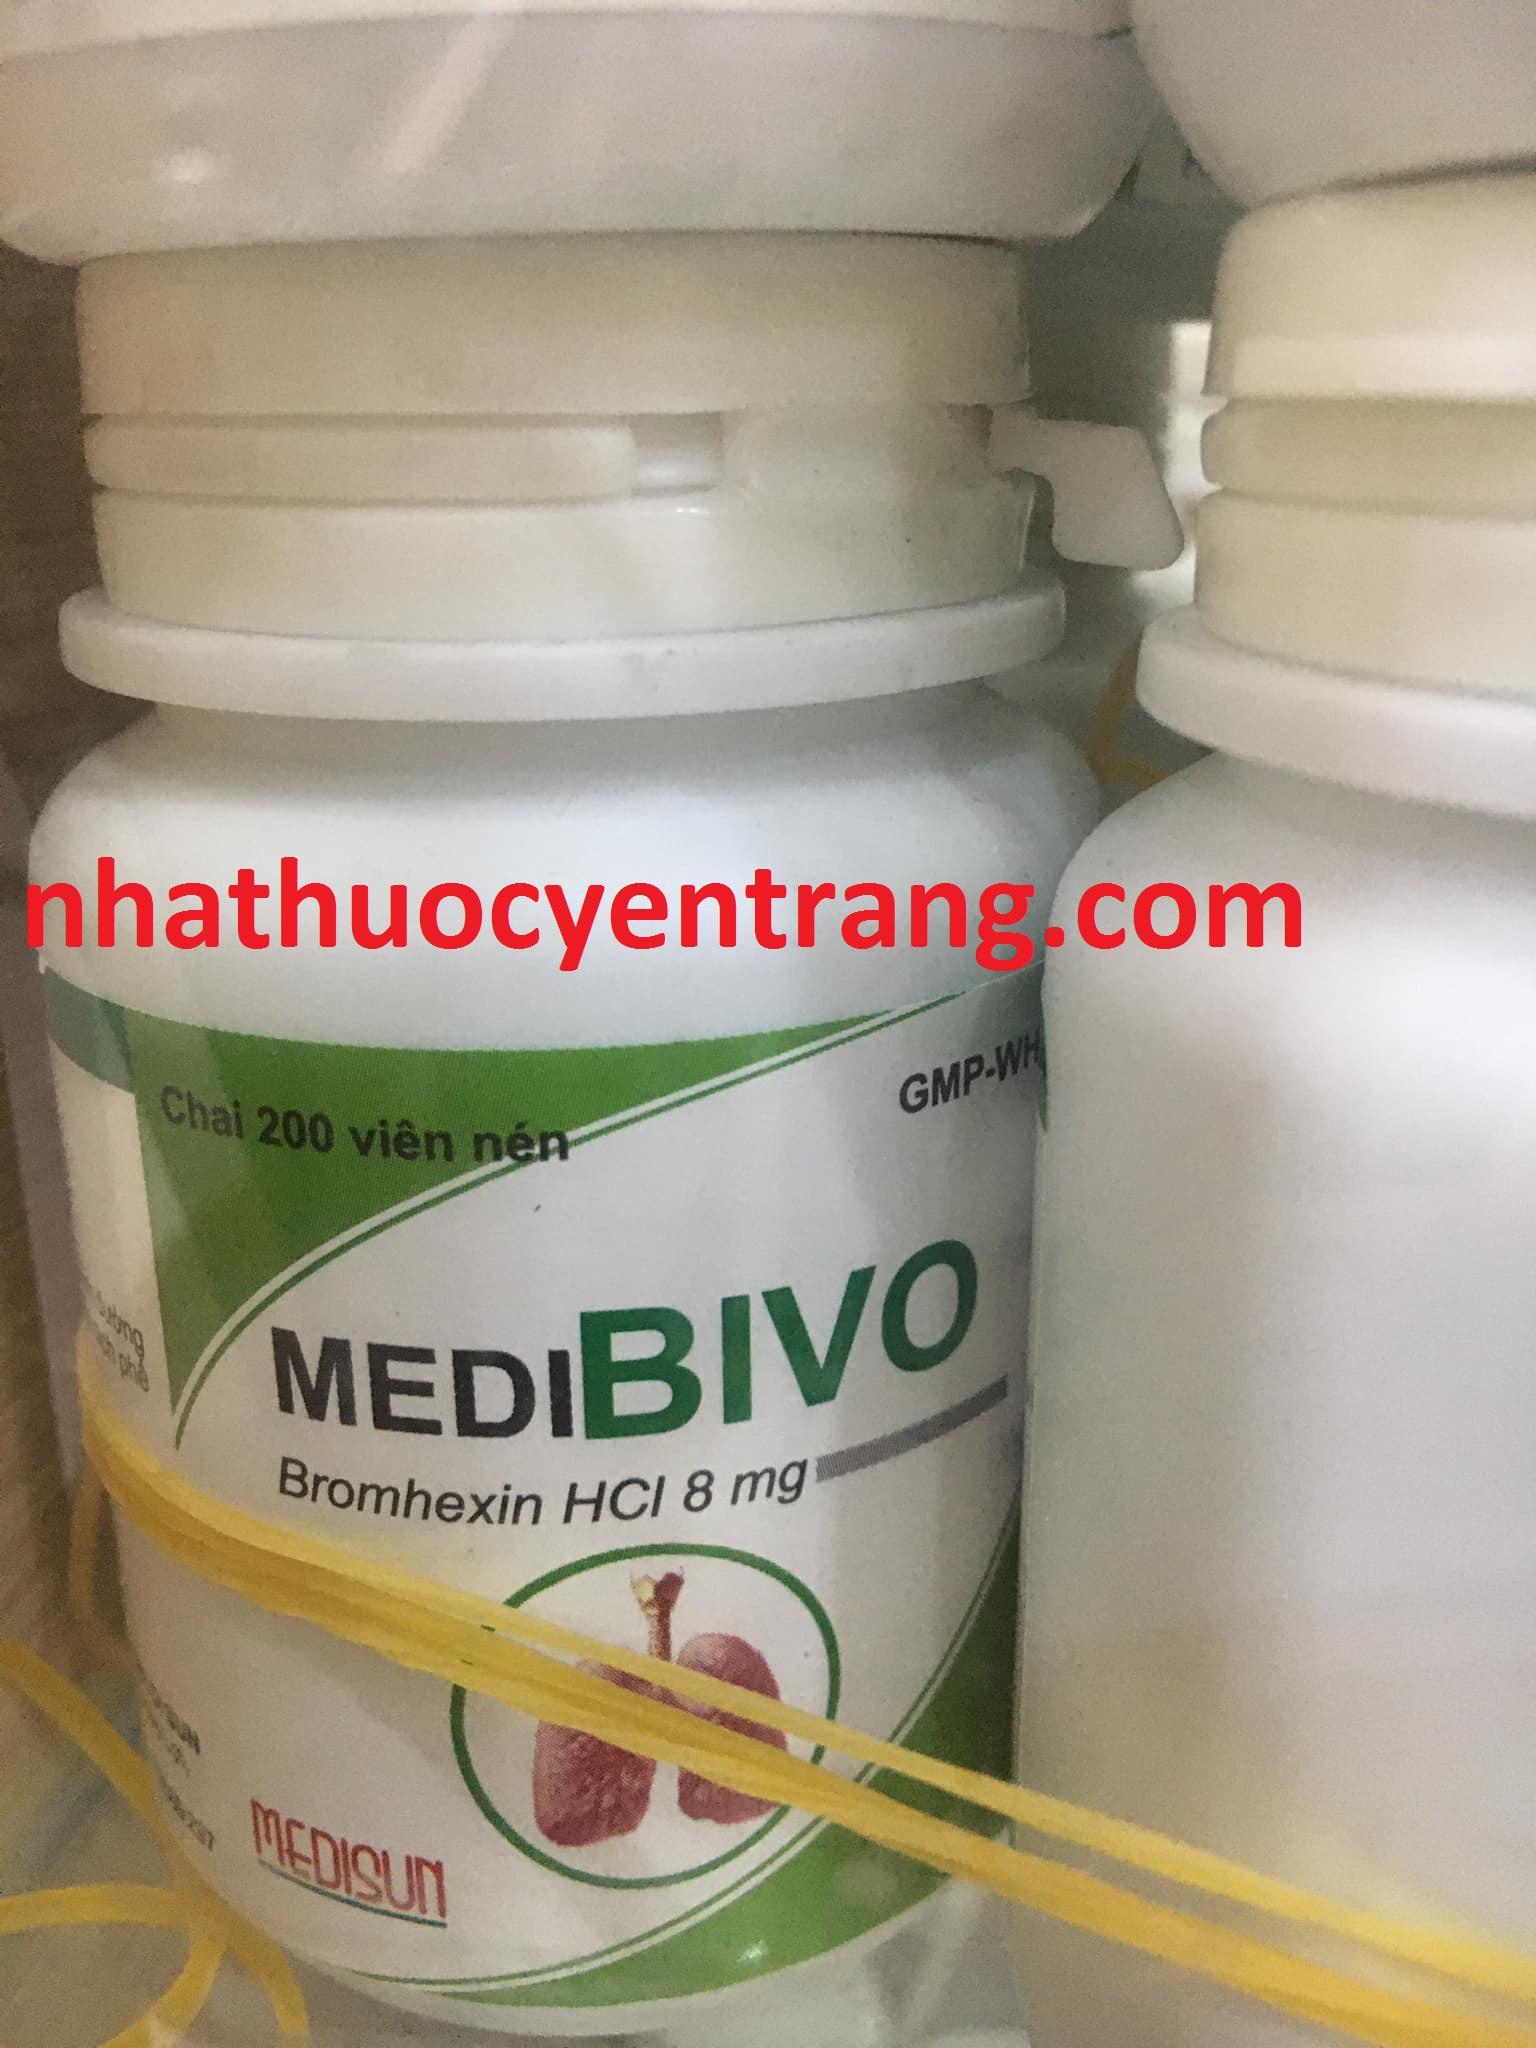 MediBiVo